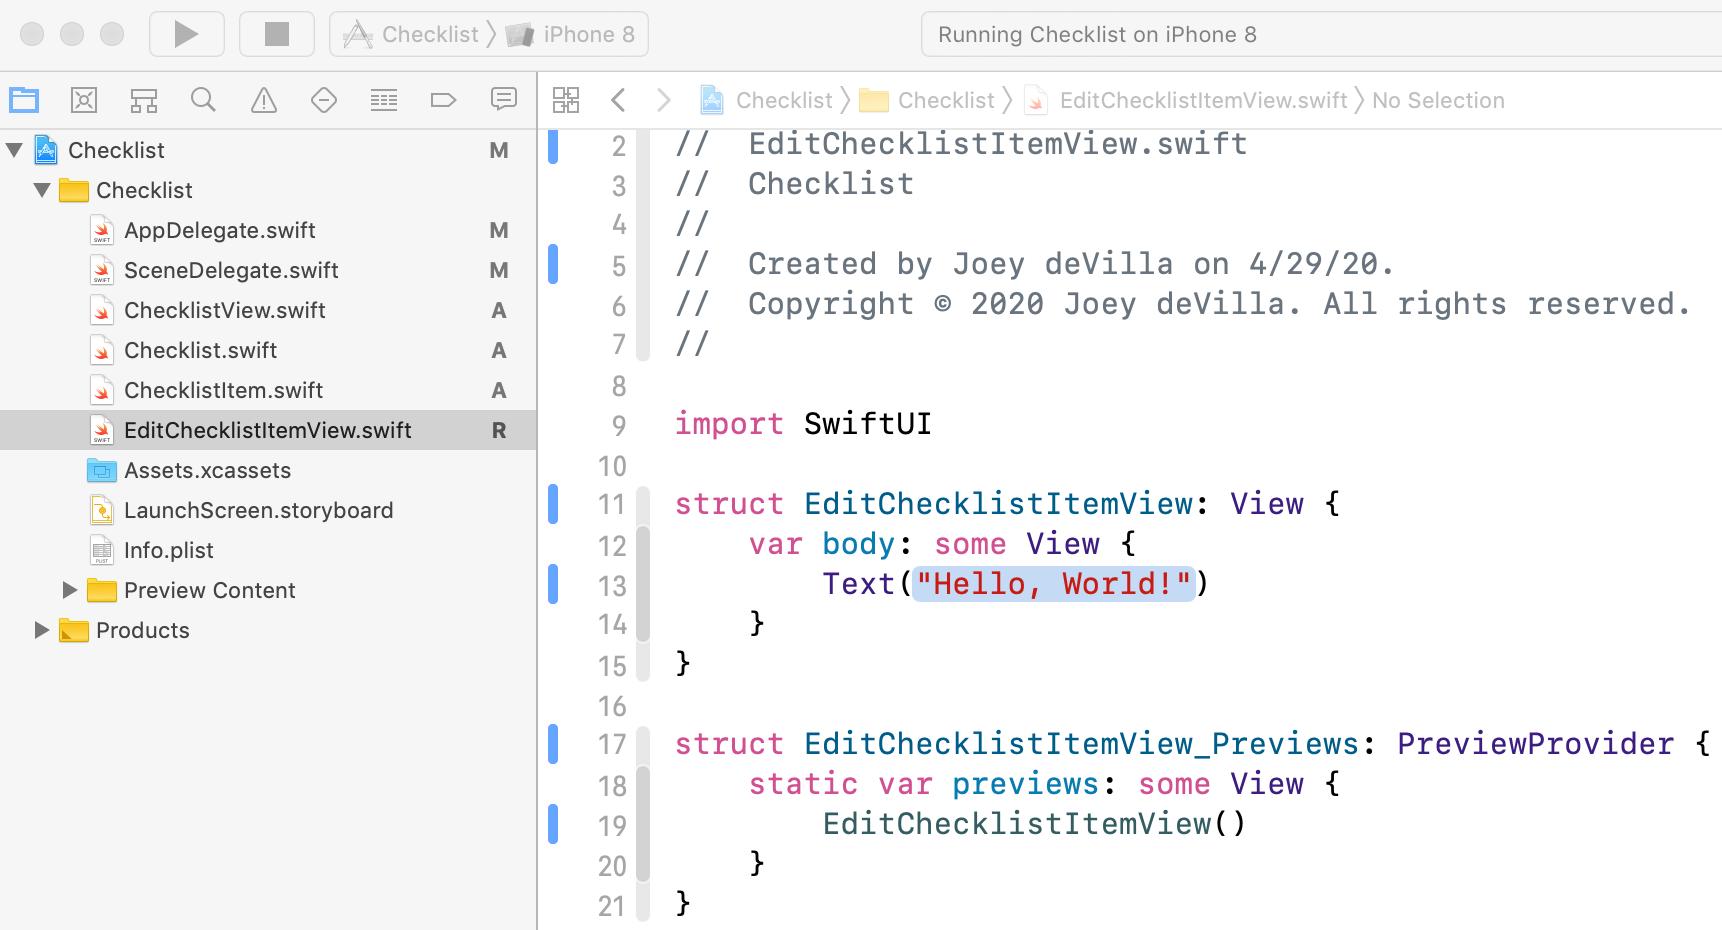 The new EditChecklistItemView.swift file, now below ChecklistItem.swift